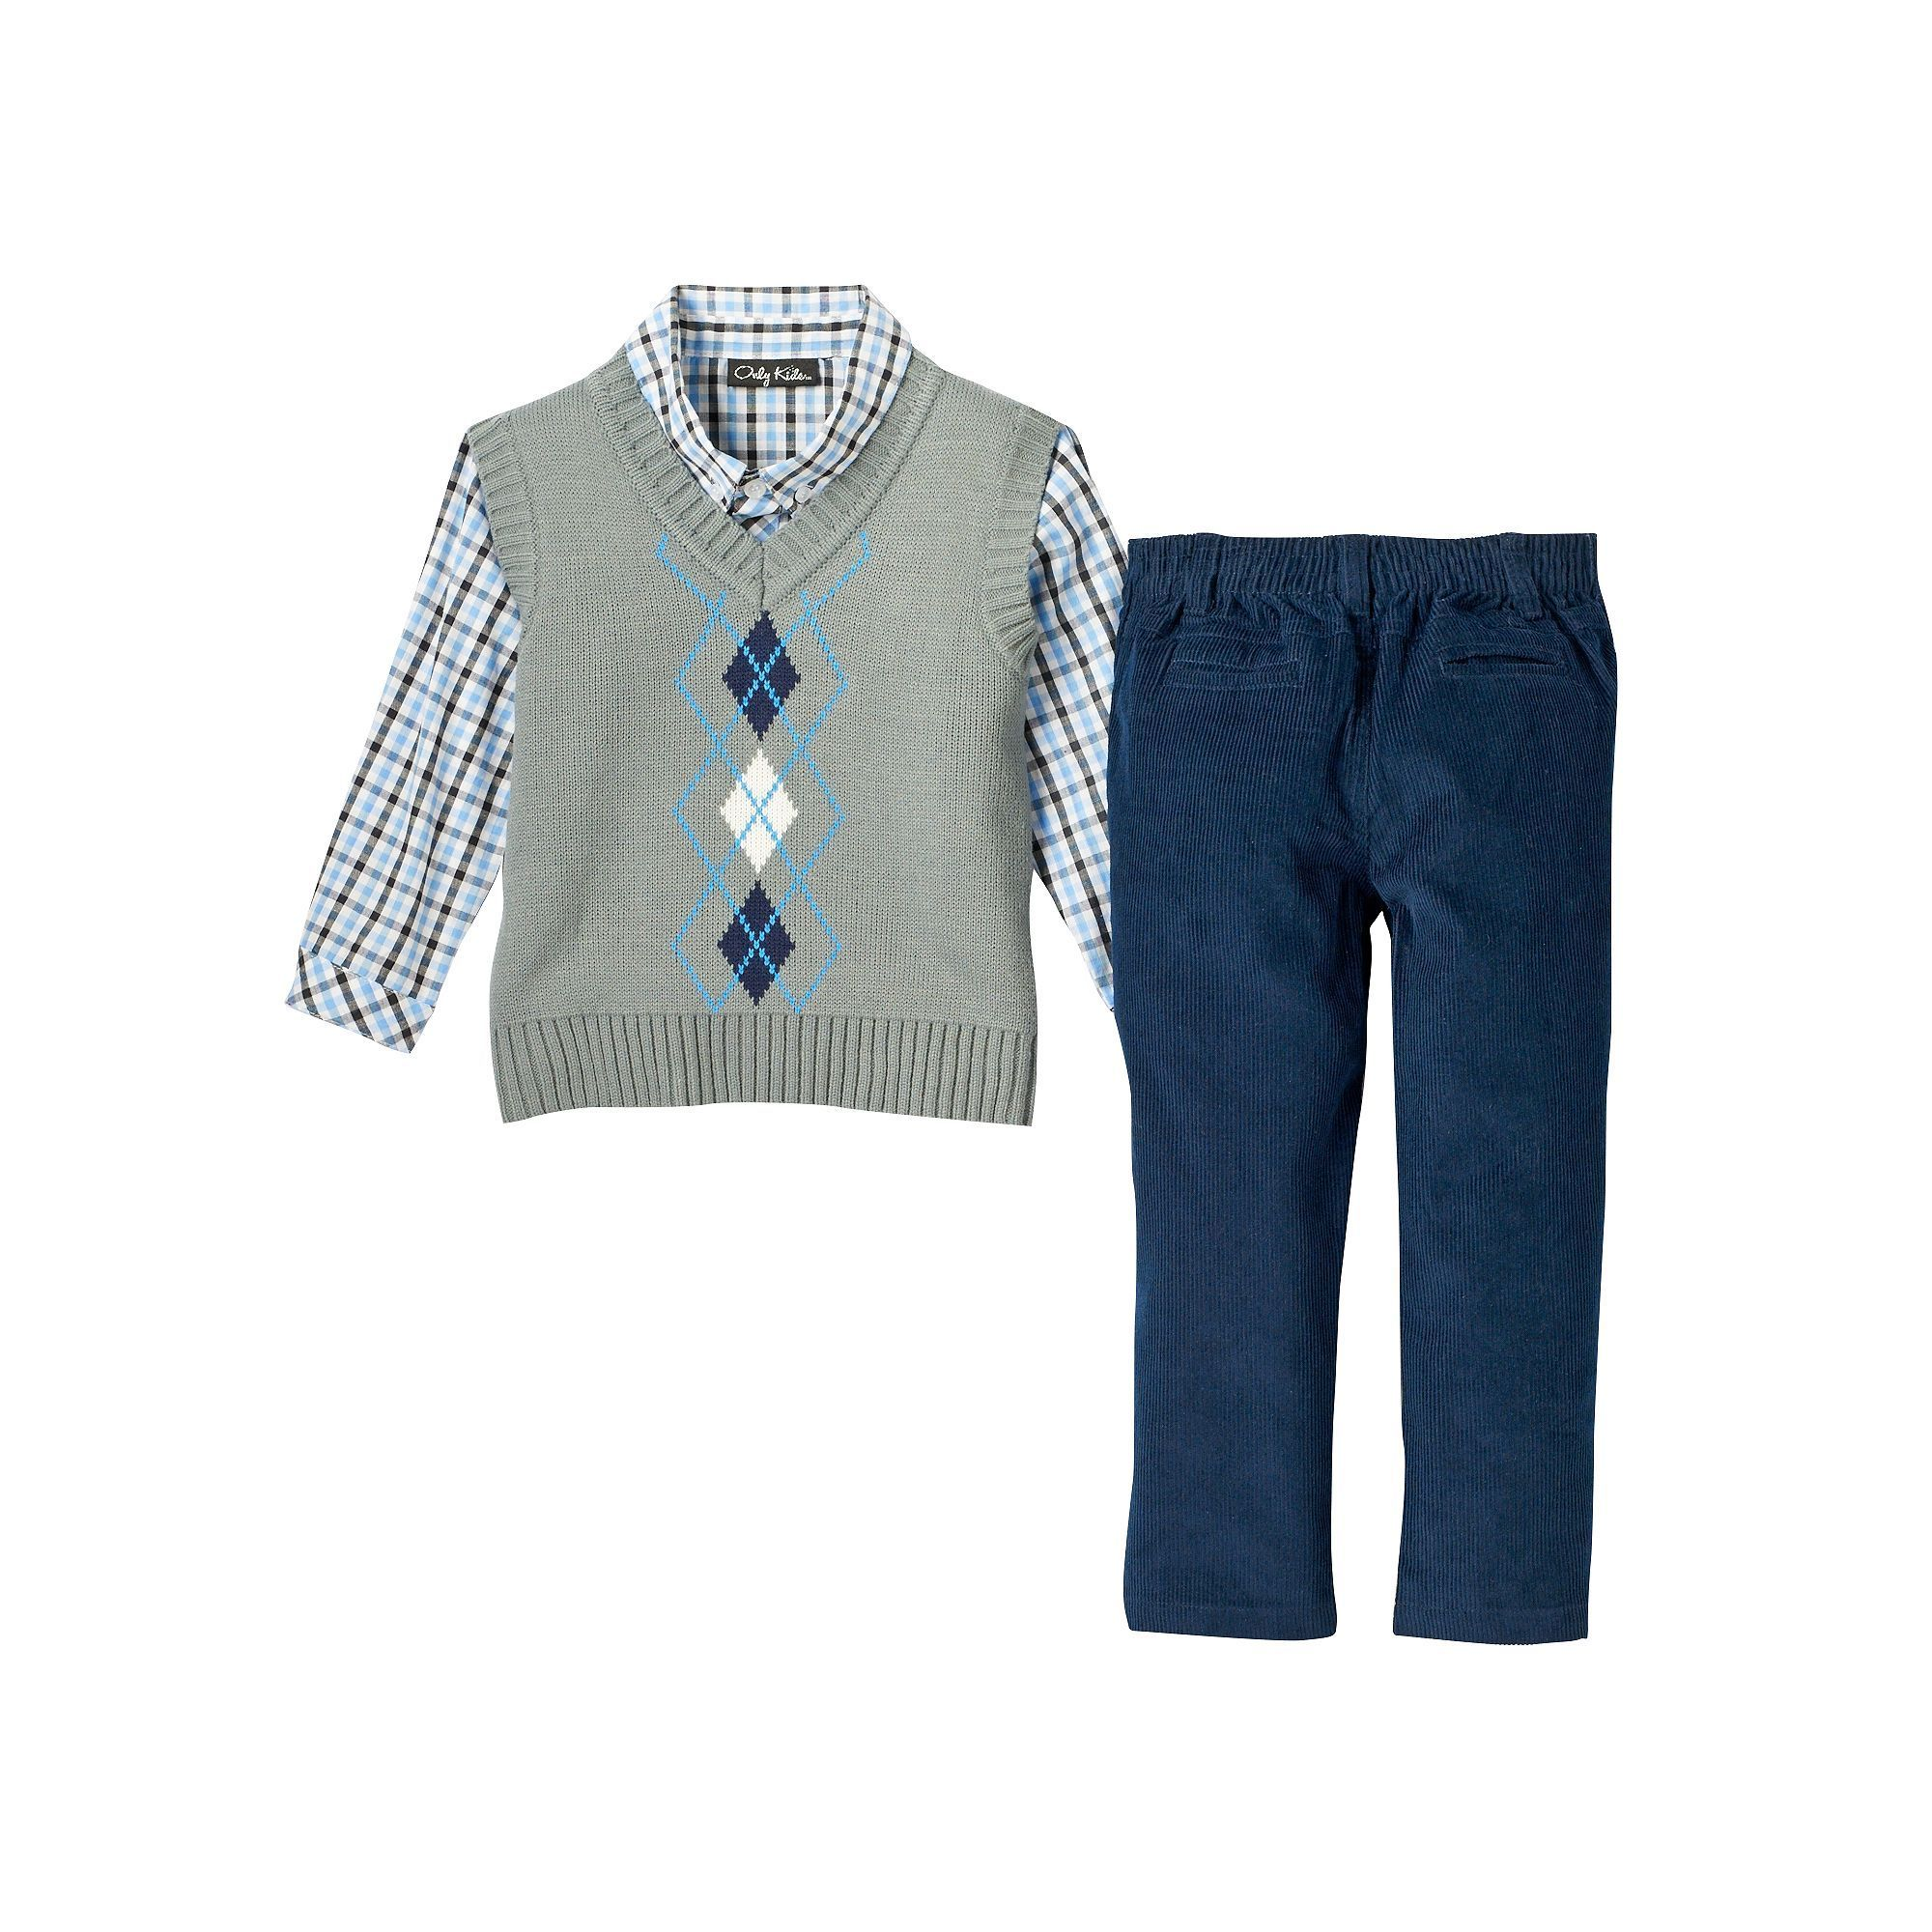 00cba1baa Baby Boy Only Kids Apparel Argyle Sweater Vest